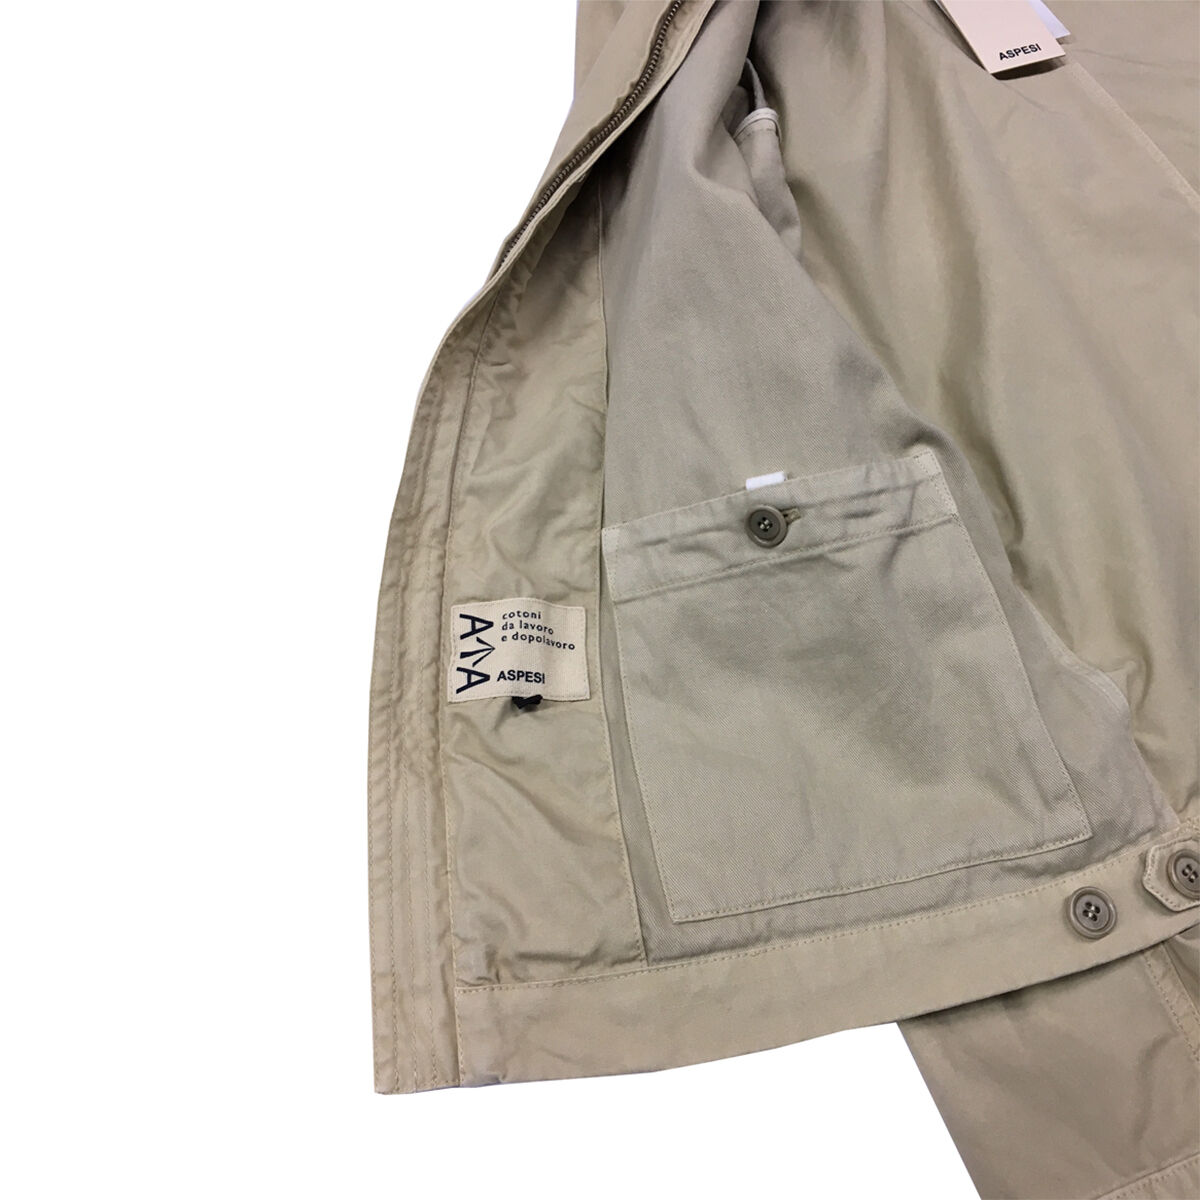 ASPESI giubbotto uomo con zip begie mod mod mod NEW FENDER A CG37 B253 71746a